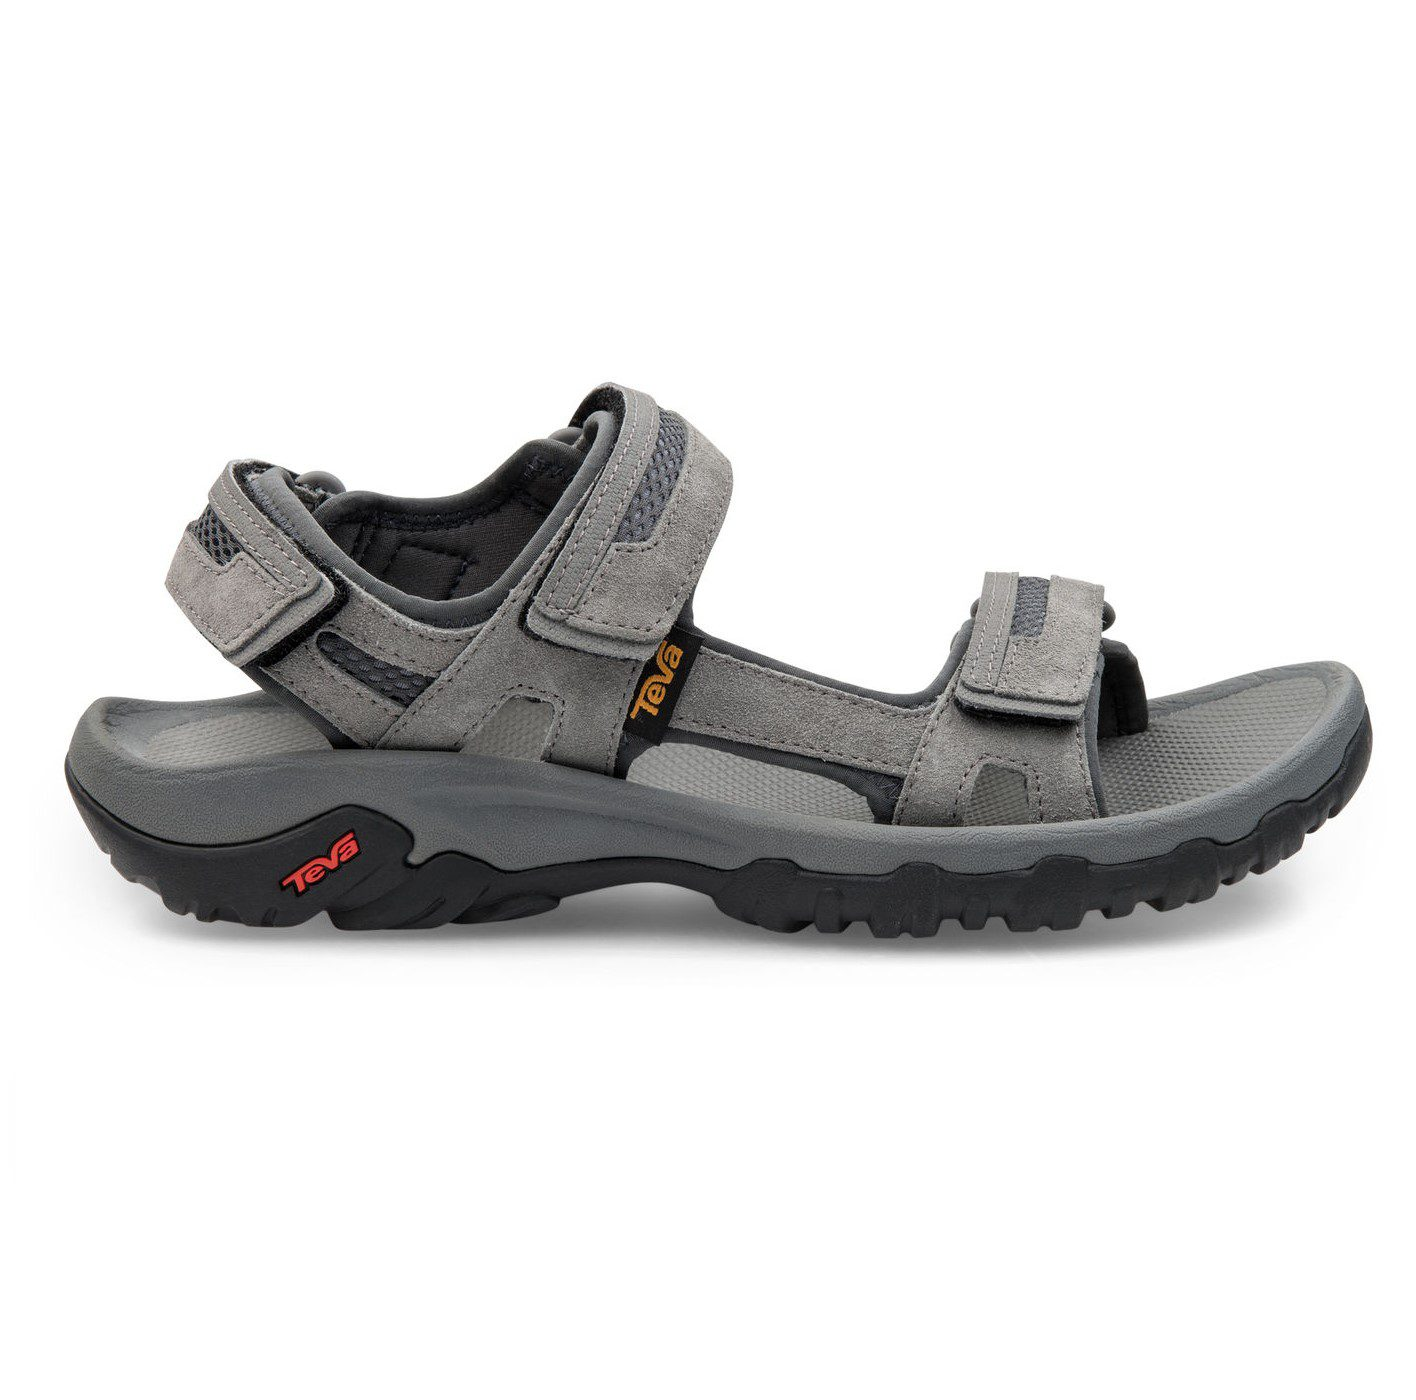 Mens Hudson Sandal - charcoal grey